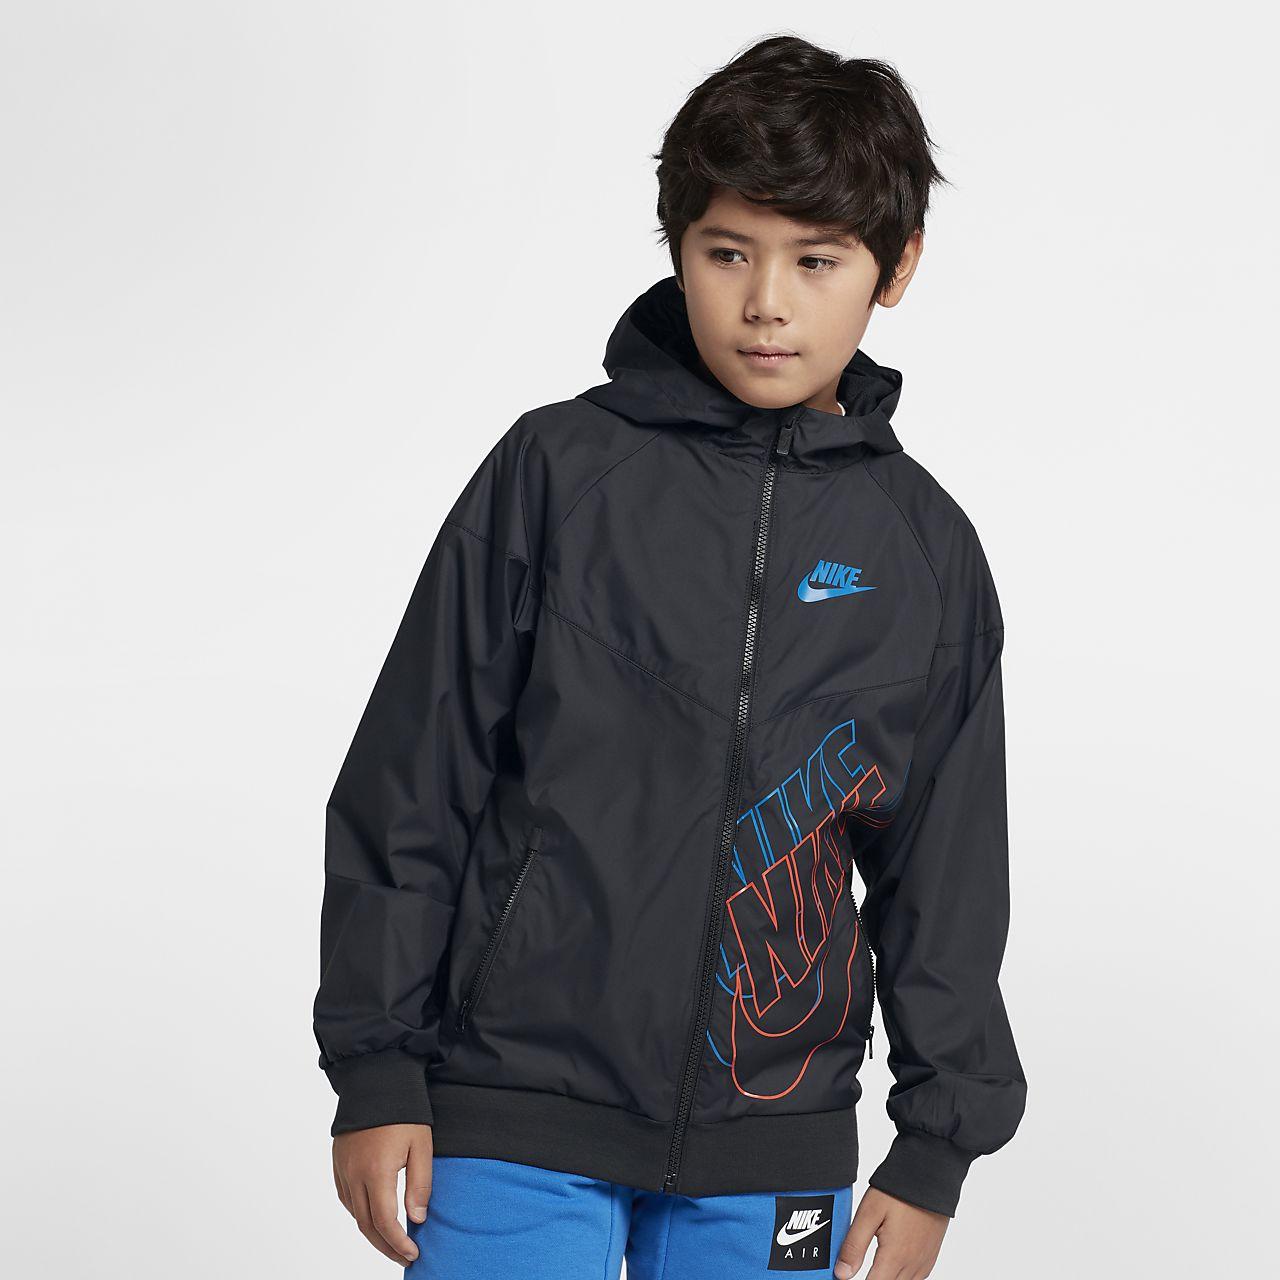 c1f1fbcee6f7 Nike Sportswear Windrunner Big Kids  (Boys ) Jacket. Nike.com